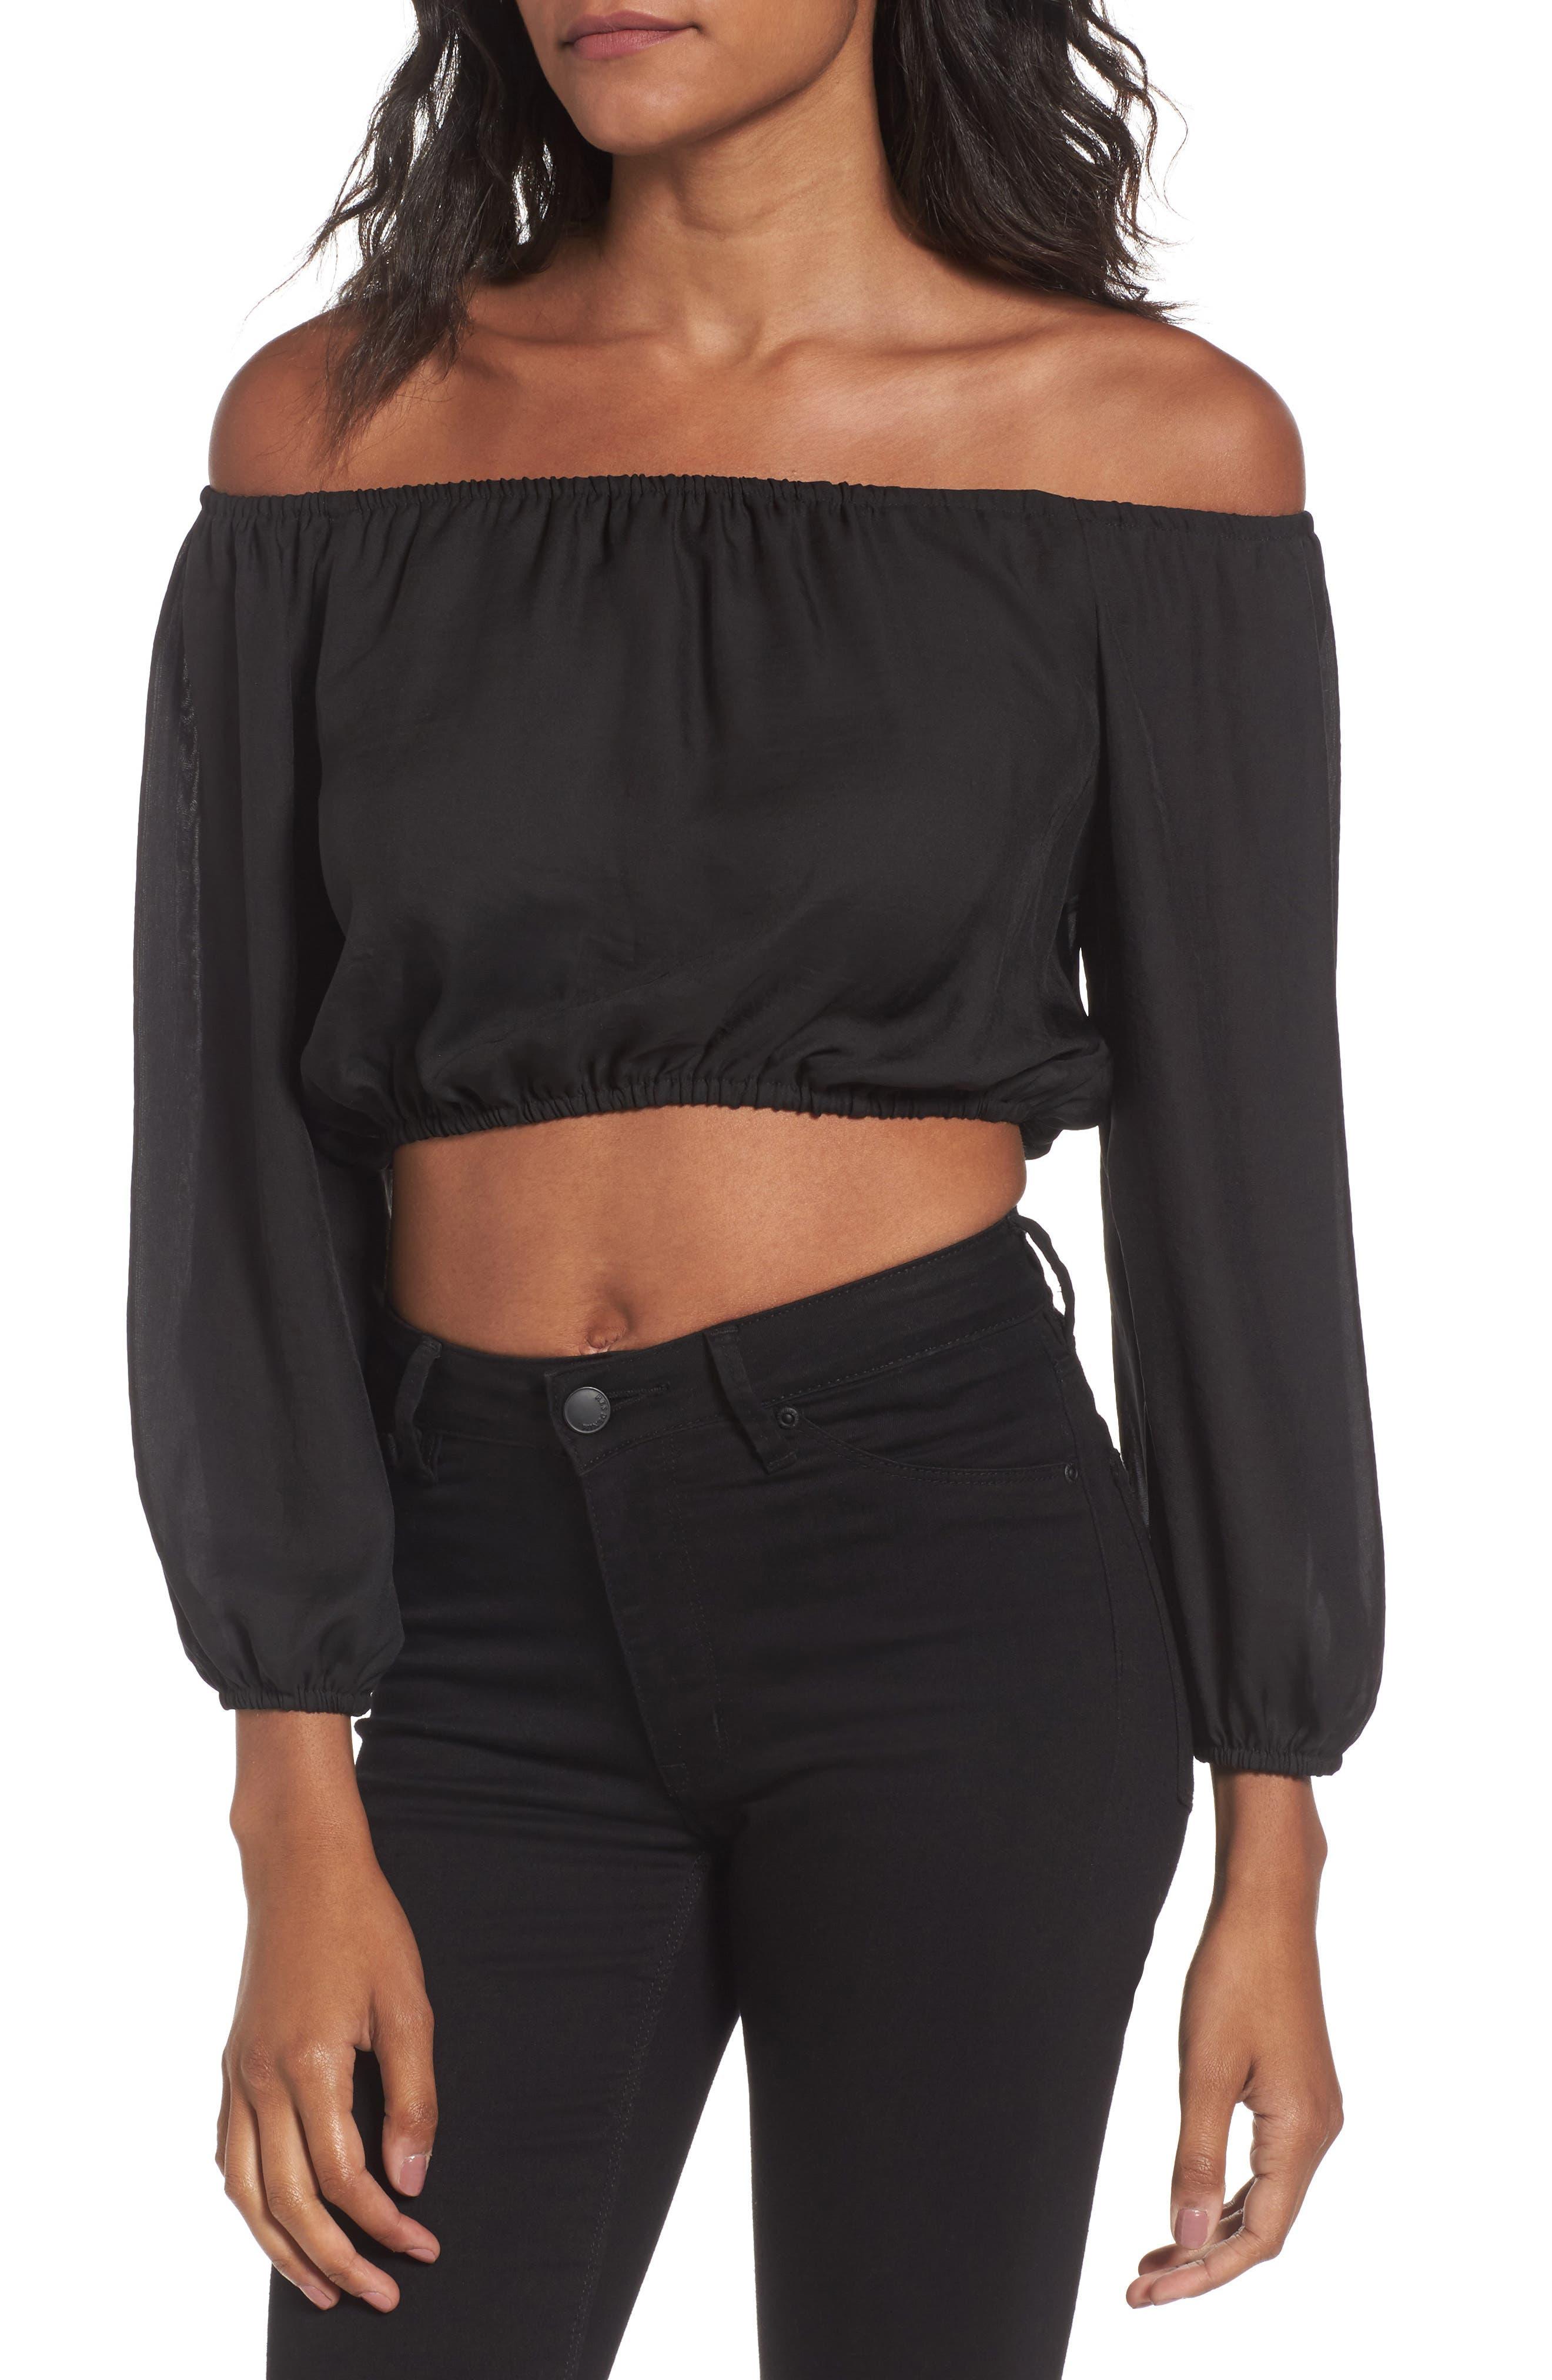 Lima Crop Top,                         Main,                         color, Black Silky Satin